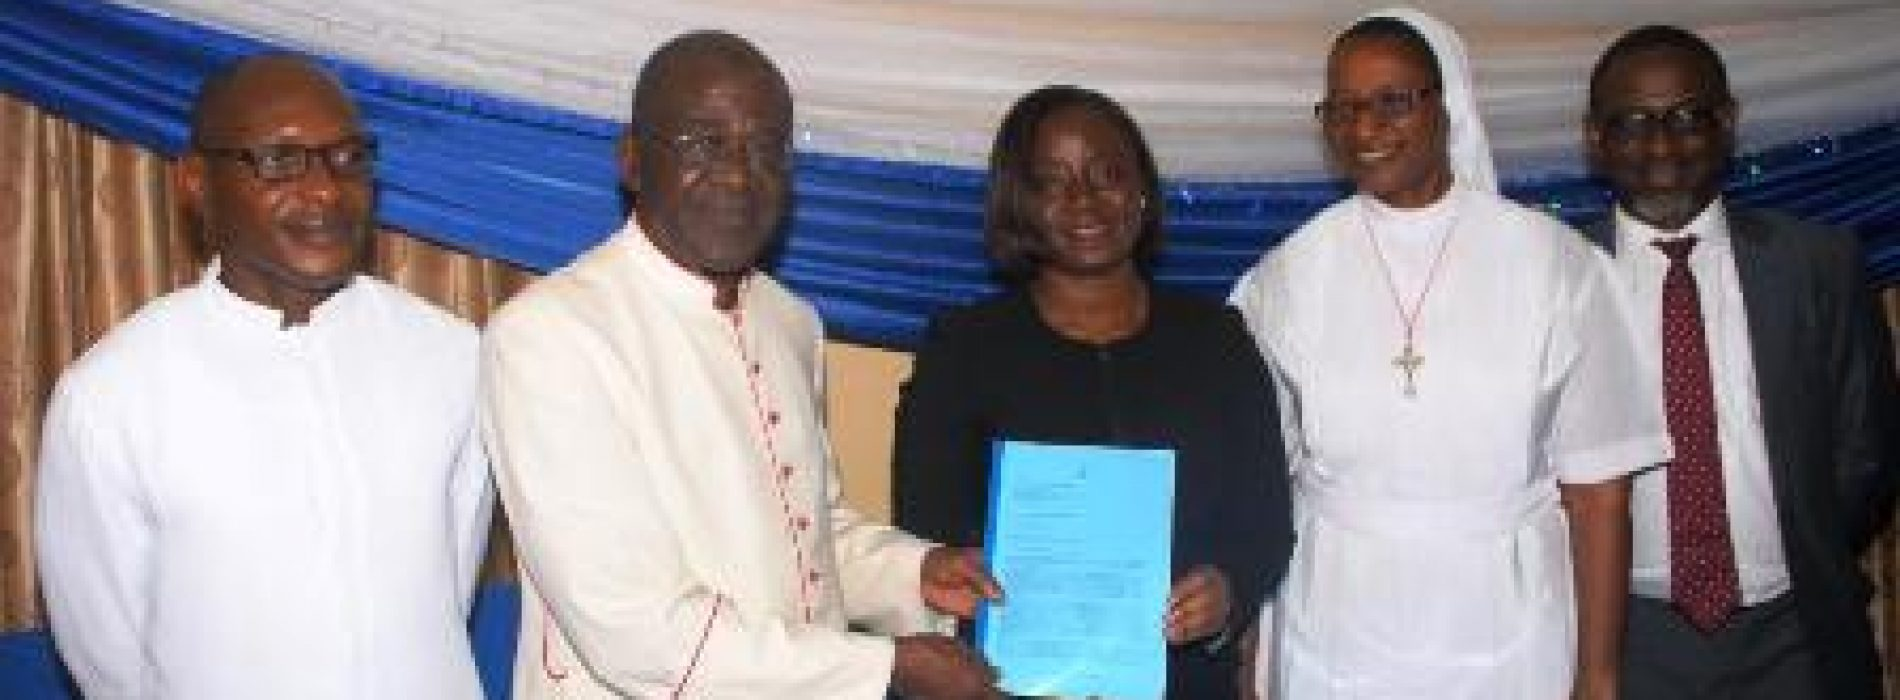 Sanofi, Lagos Catholic diocese sign pact on diabetes, hypertension management